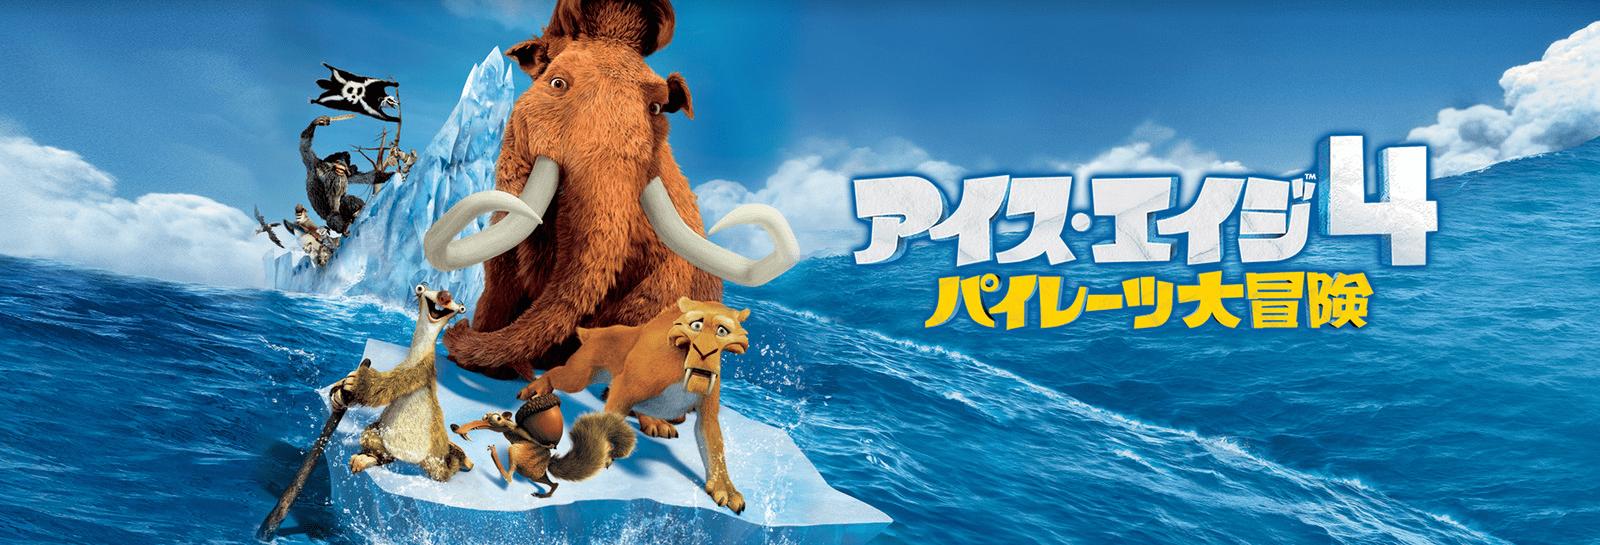 【Huluおすすめ映画ラインナップ】Hulu(フールー)配信中のおすすめ映画作品一覧|洋画・邦画・アニメ作品に分けてご紹介|おすすめ映画:長編アニメ編:アイス・エイジ4 / パイレーツ大冒険